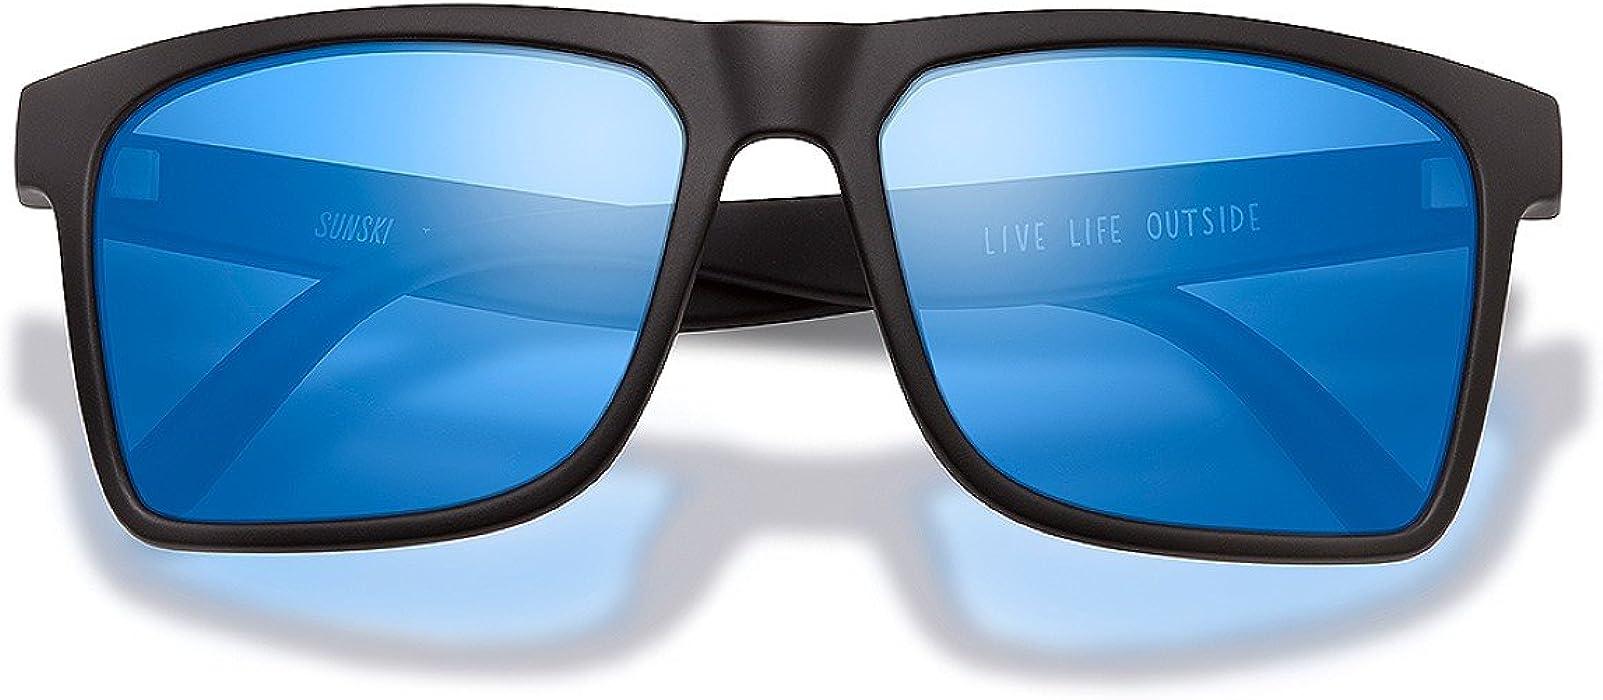 047d473945 Sunski Taraval Polarized Lightweight Comfortable Sunglasses for Men and  Women